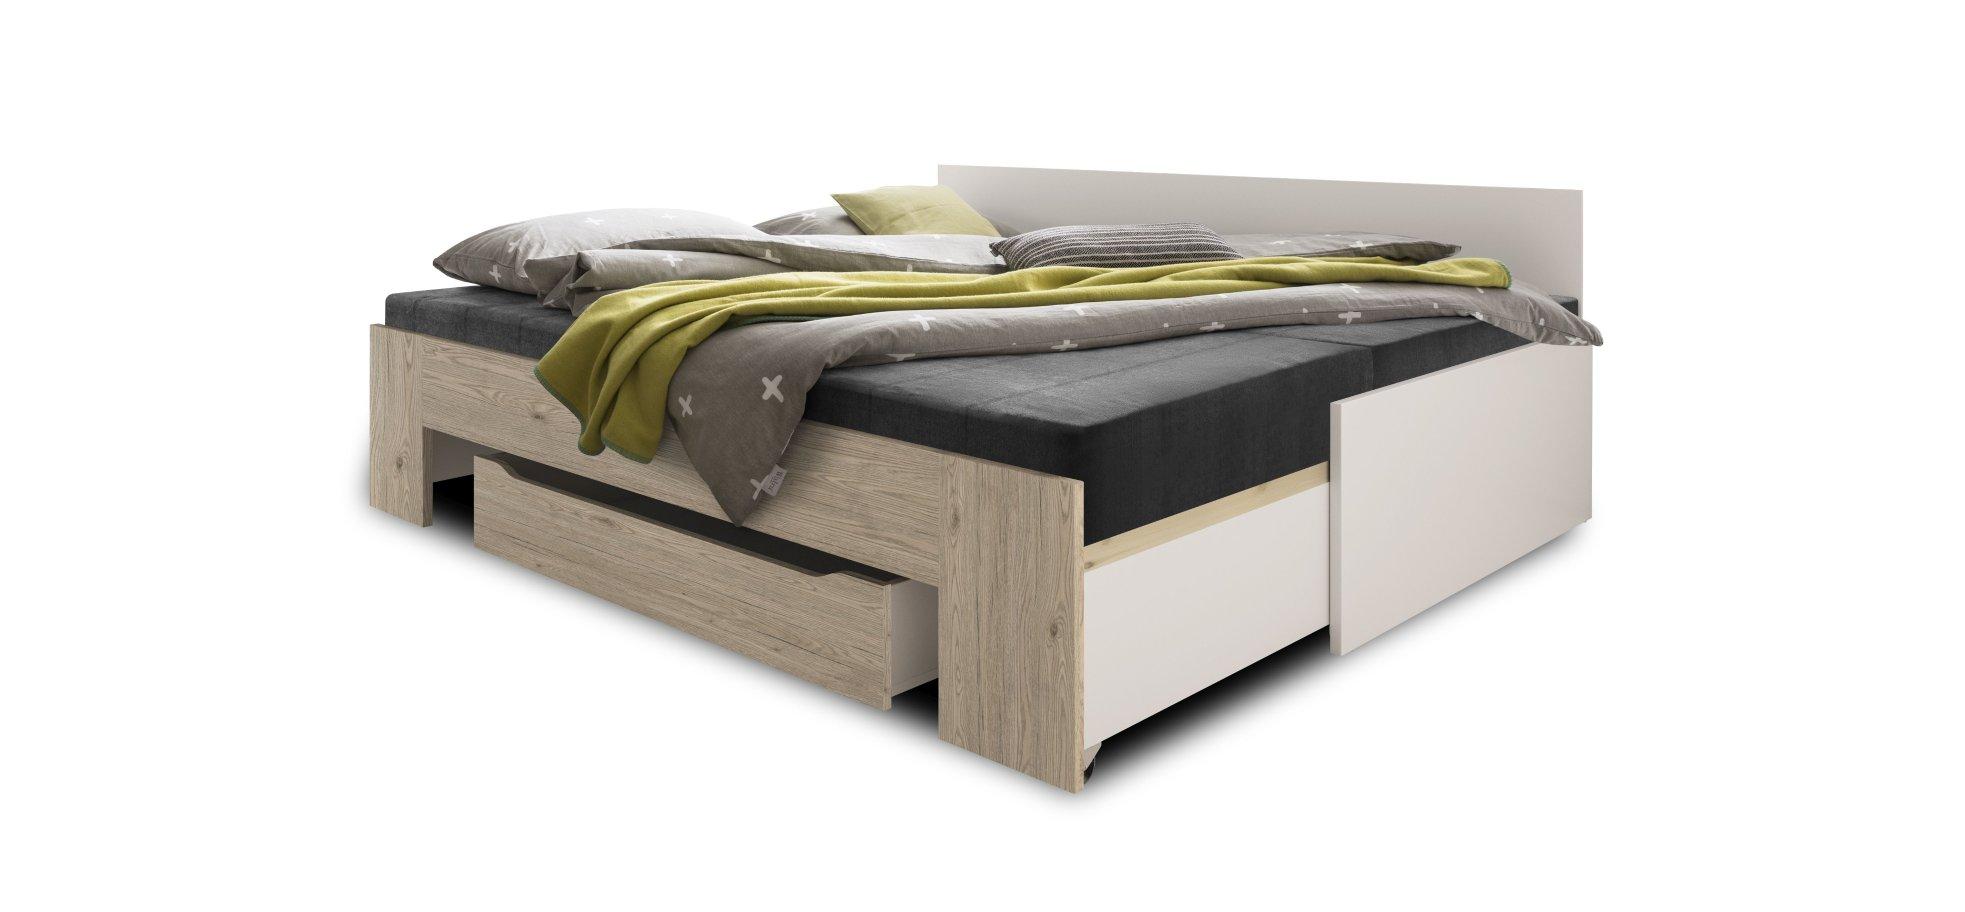 Full Size of Ausziehbares Doppelbett Sortiment Mbel Hesse Bett Wohnzimmer Ausziehbares Doppelbett